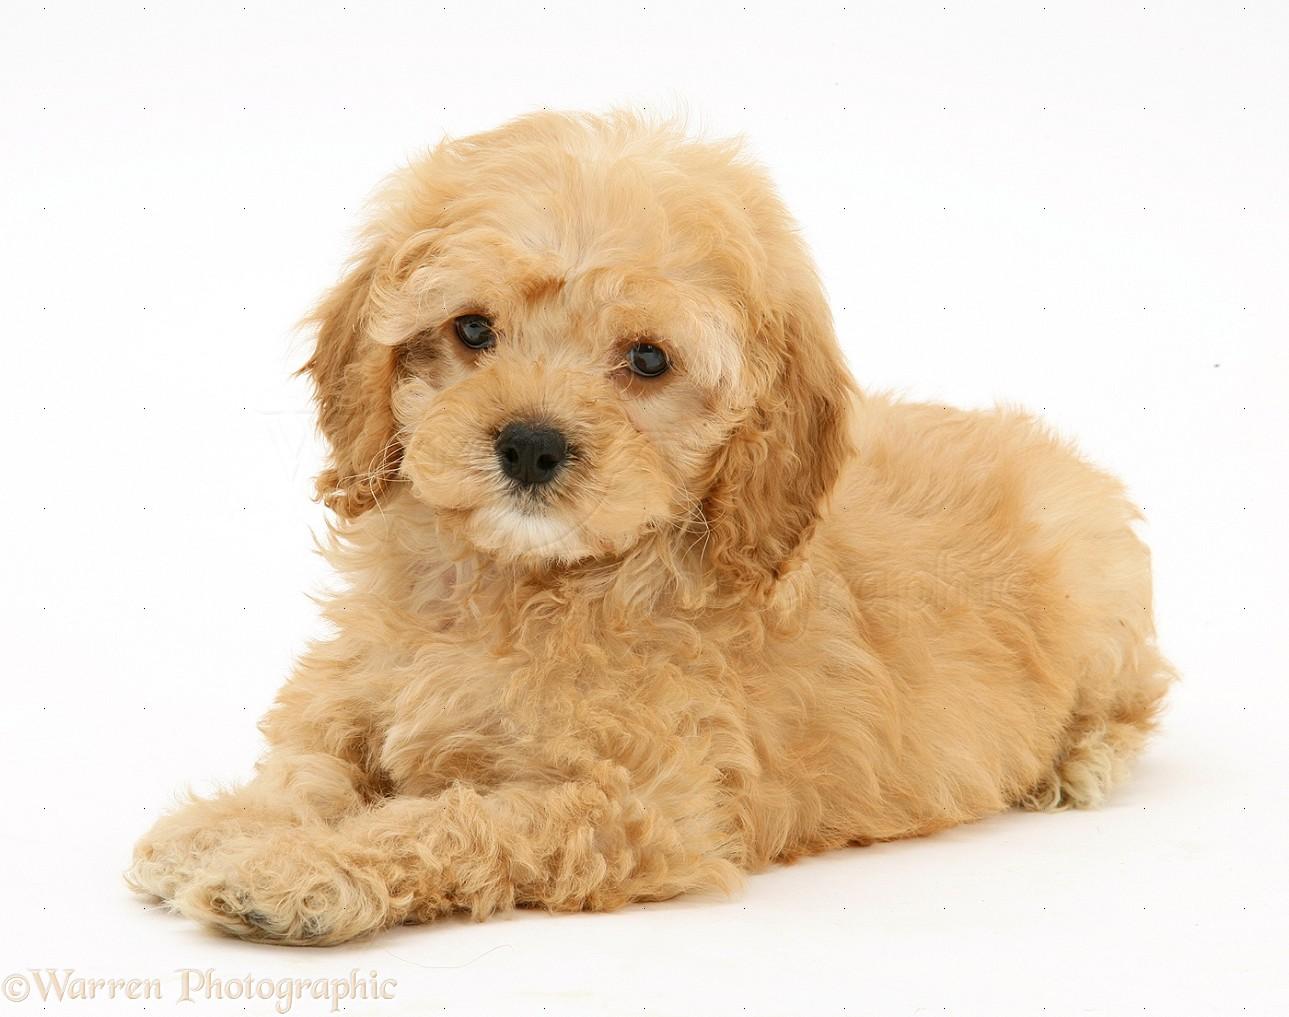 Dog American Cockapoo Puppy 8 Weeks Old Photo Wp17023